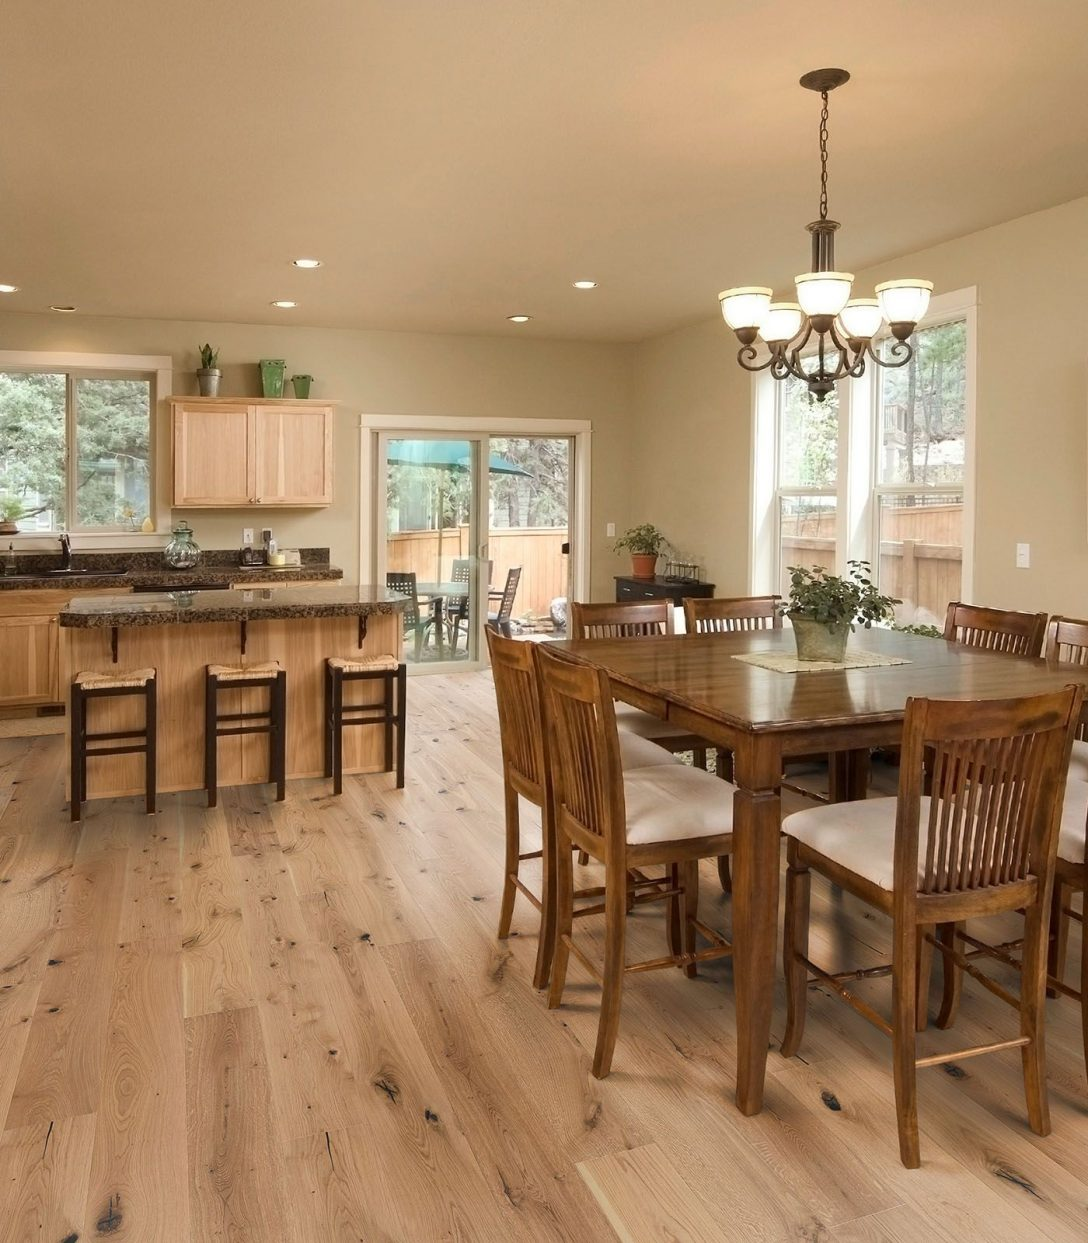 Large Size of Bodenbelag Küche Altbau Bodenbelag Küche Und Wohnzimmer Bodenbelag Für Küche Bodenbeläge Für Küche Und Flur Küche Bodenbelag Küche